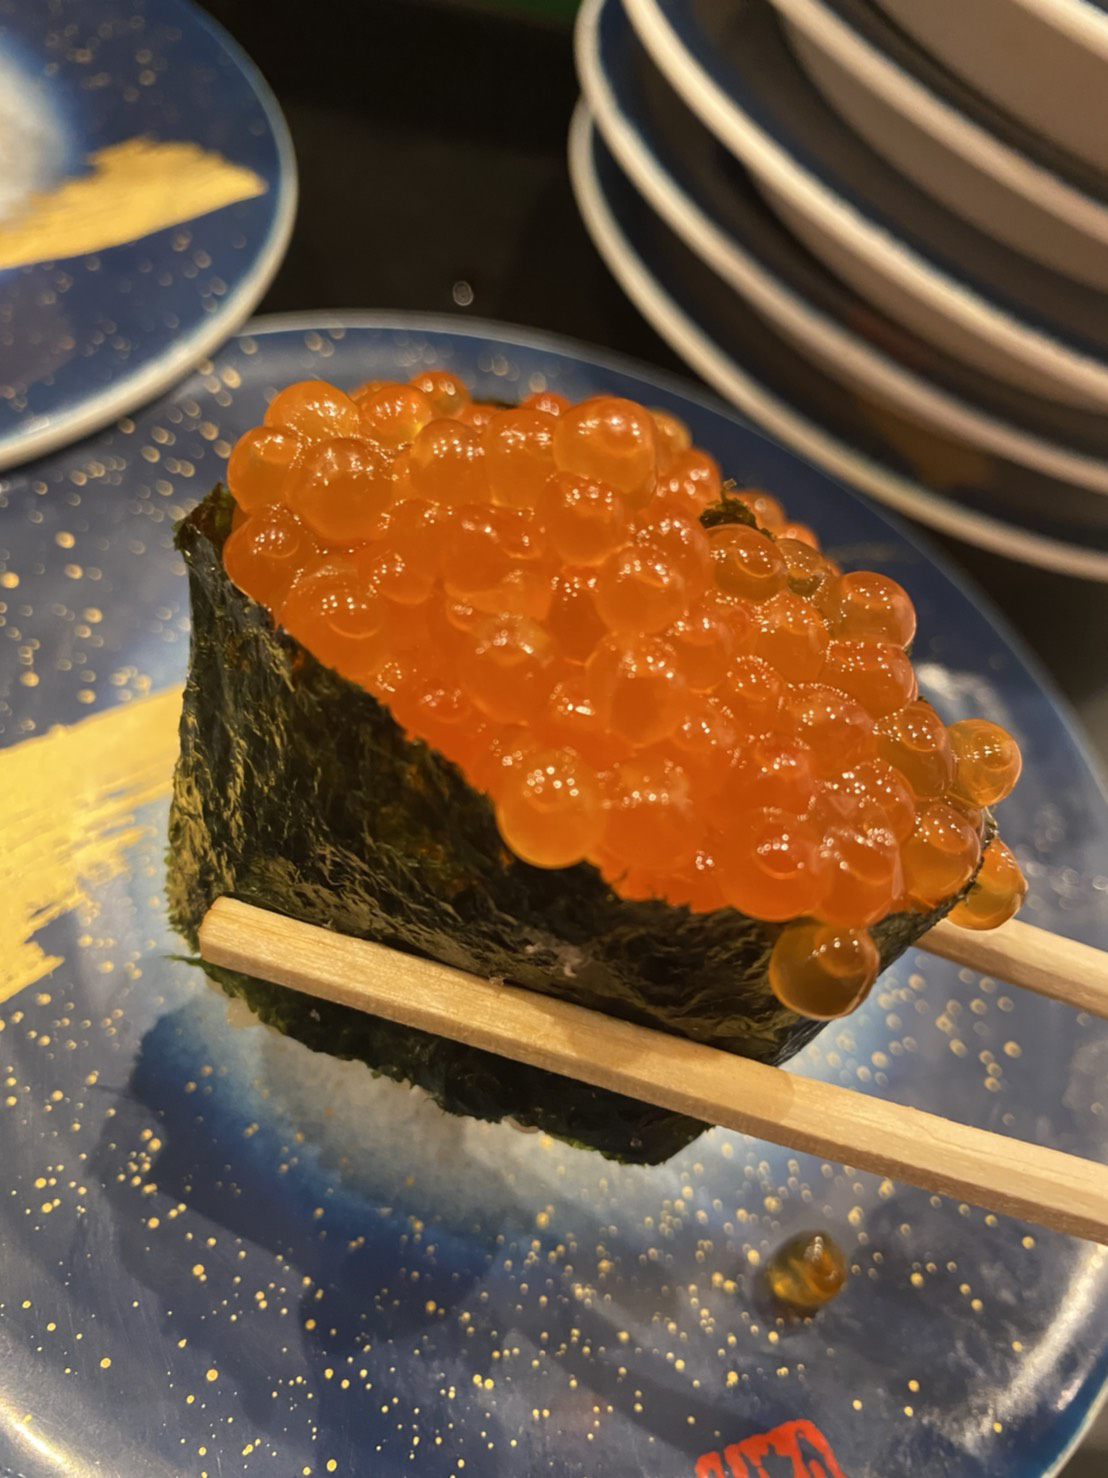 江戸前回転寿司もり一 船橋南口店の投稿写真1